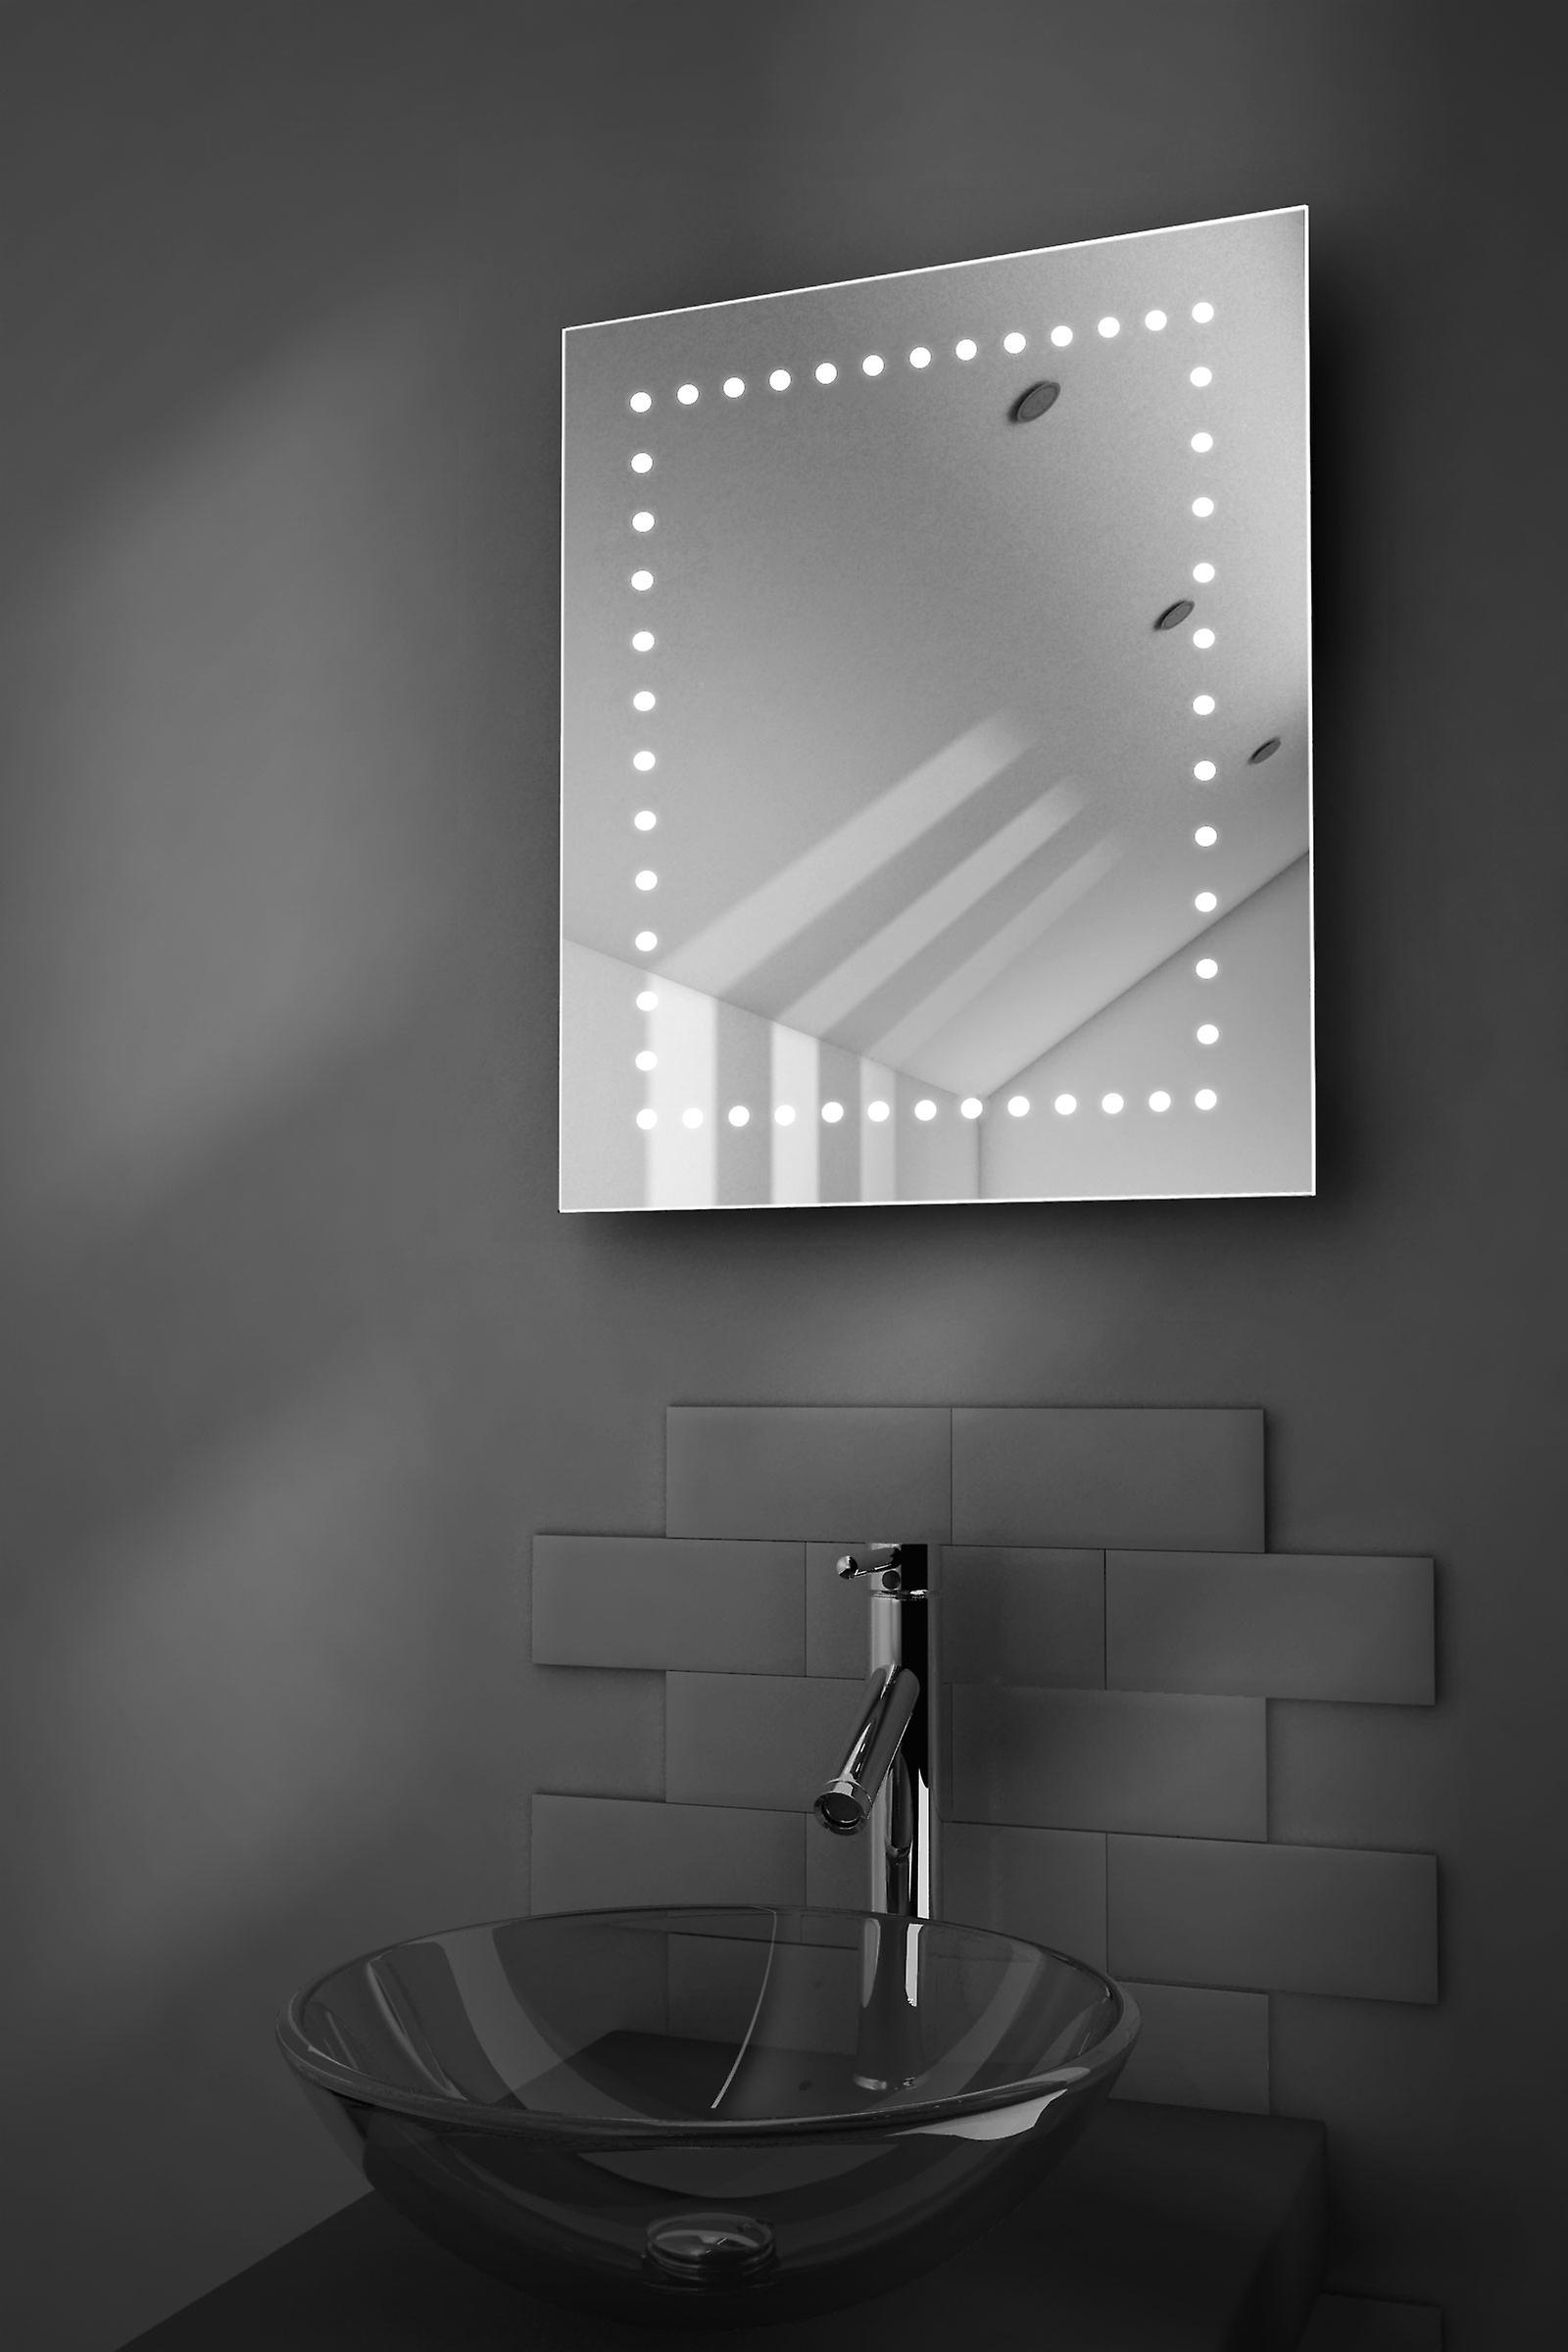 Desire Ultra-Slim LED Bathroom Mirror With Demister Pad & Sensor k39